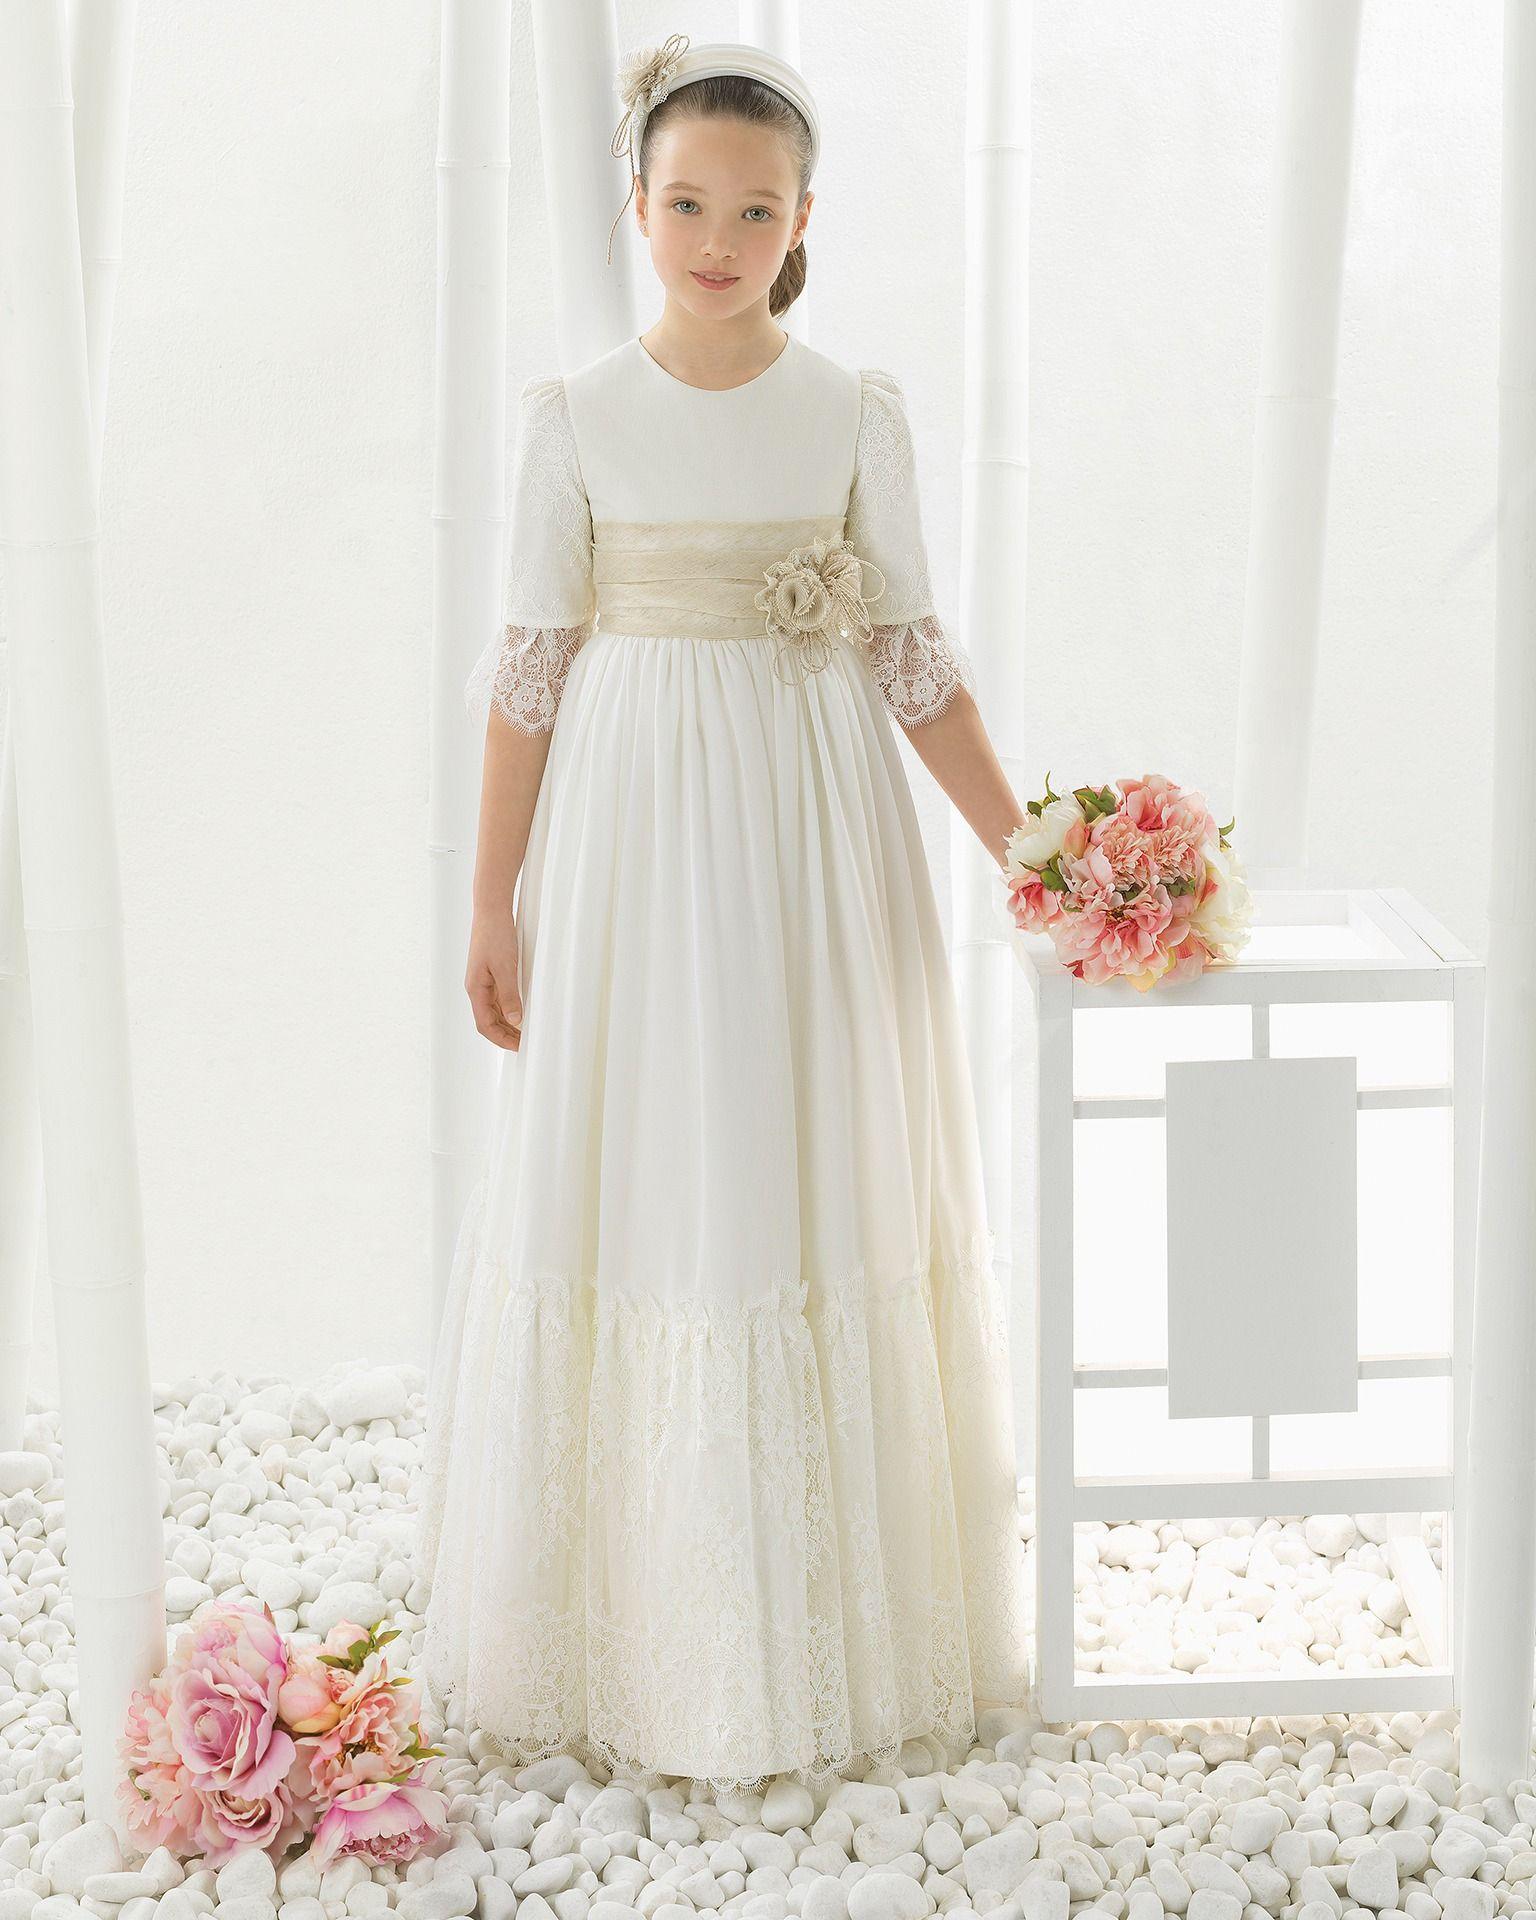 R1624 | Communion dresses, Communion and Baptism dress